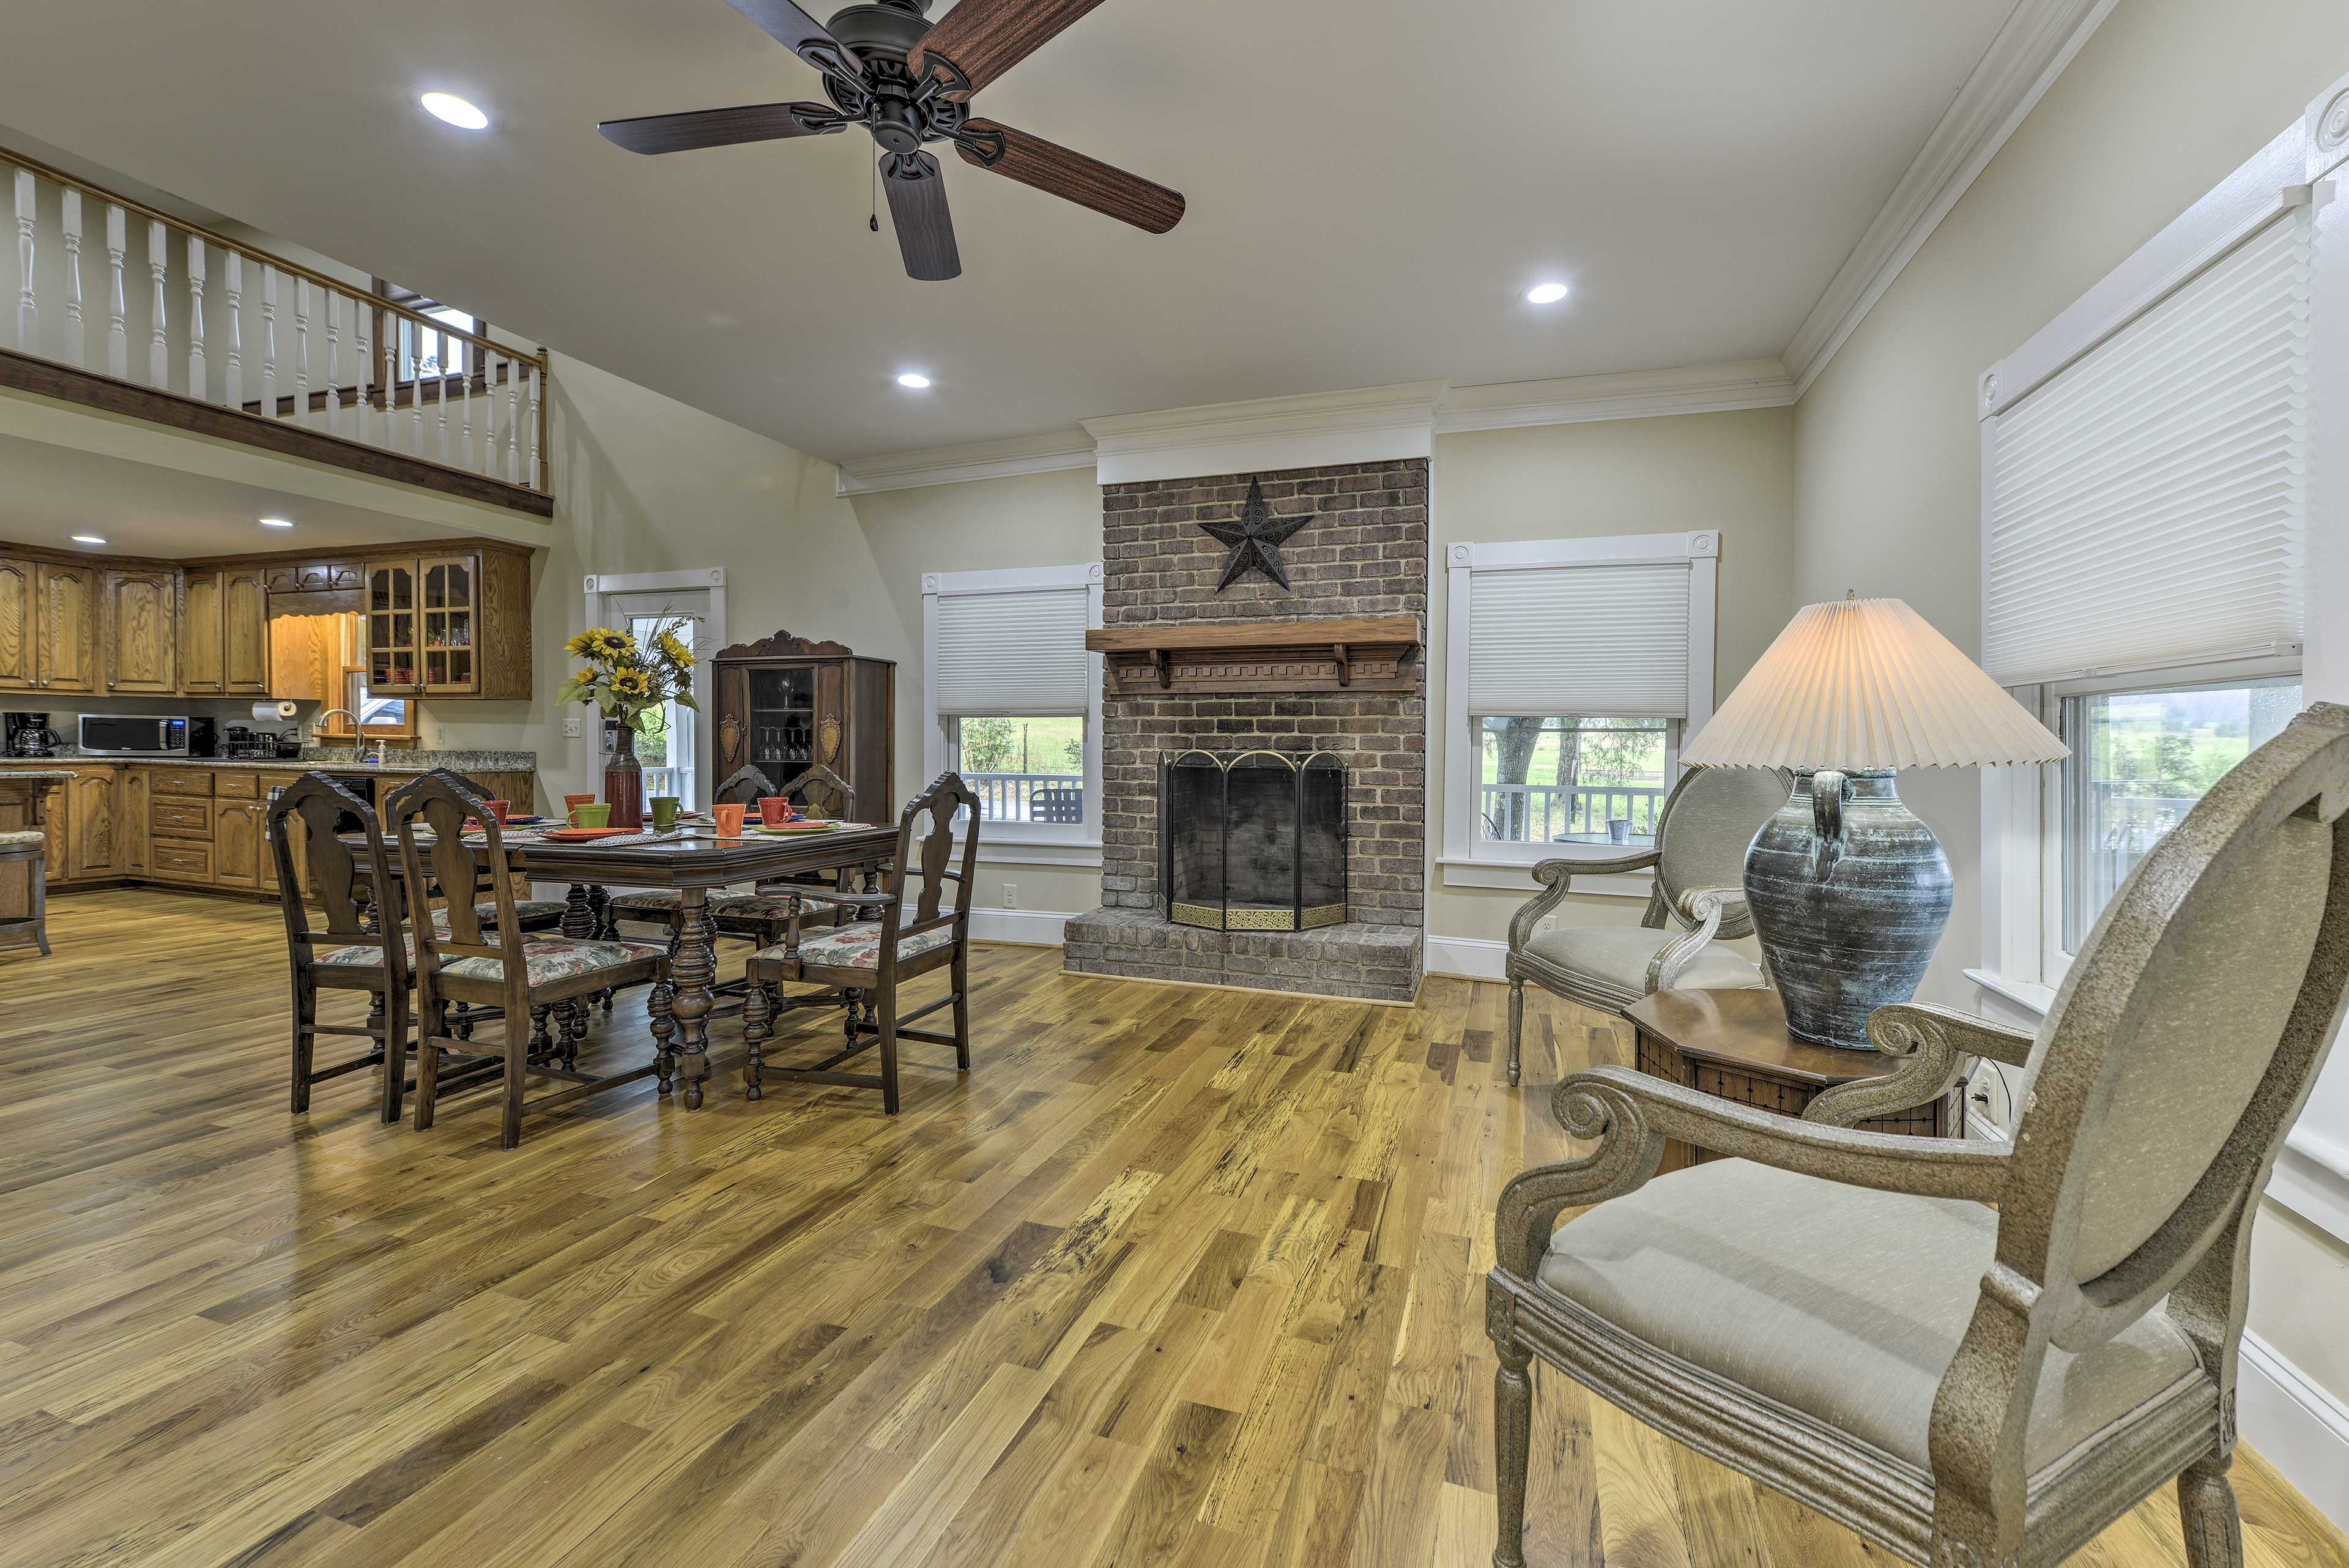 Book this Pittsboro vacation rental farmhouse for your North Carolina retreat.